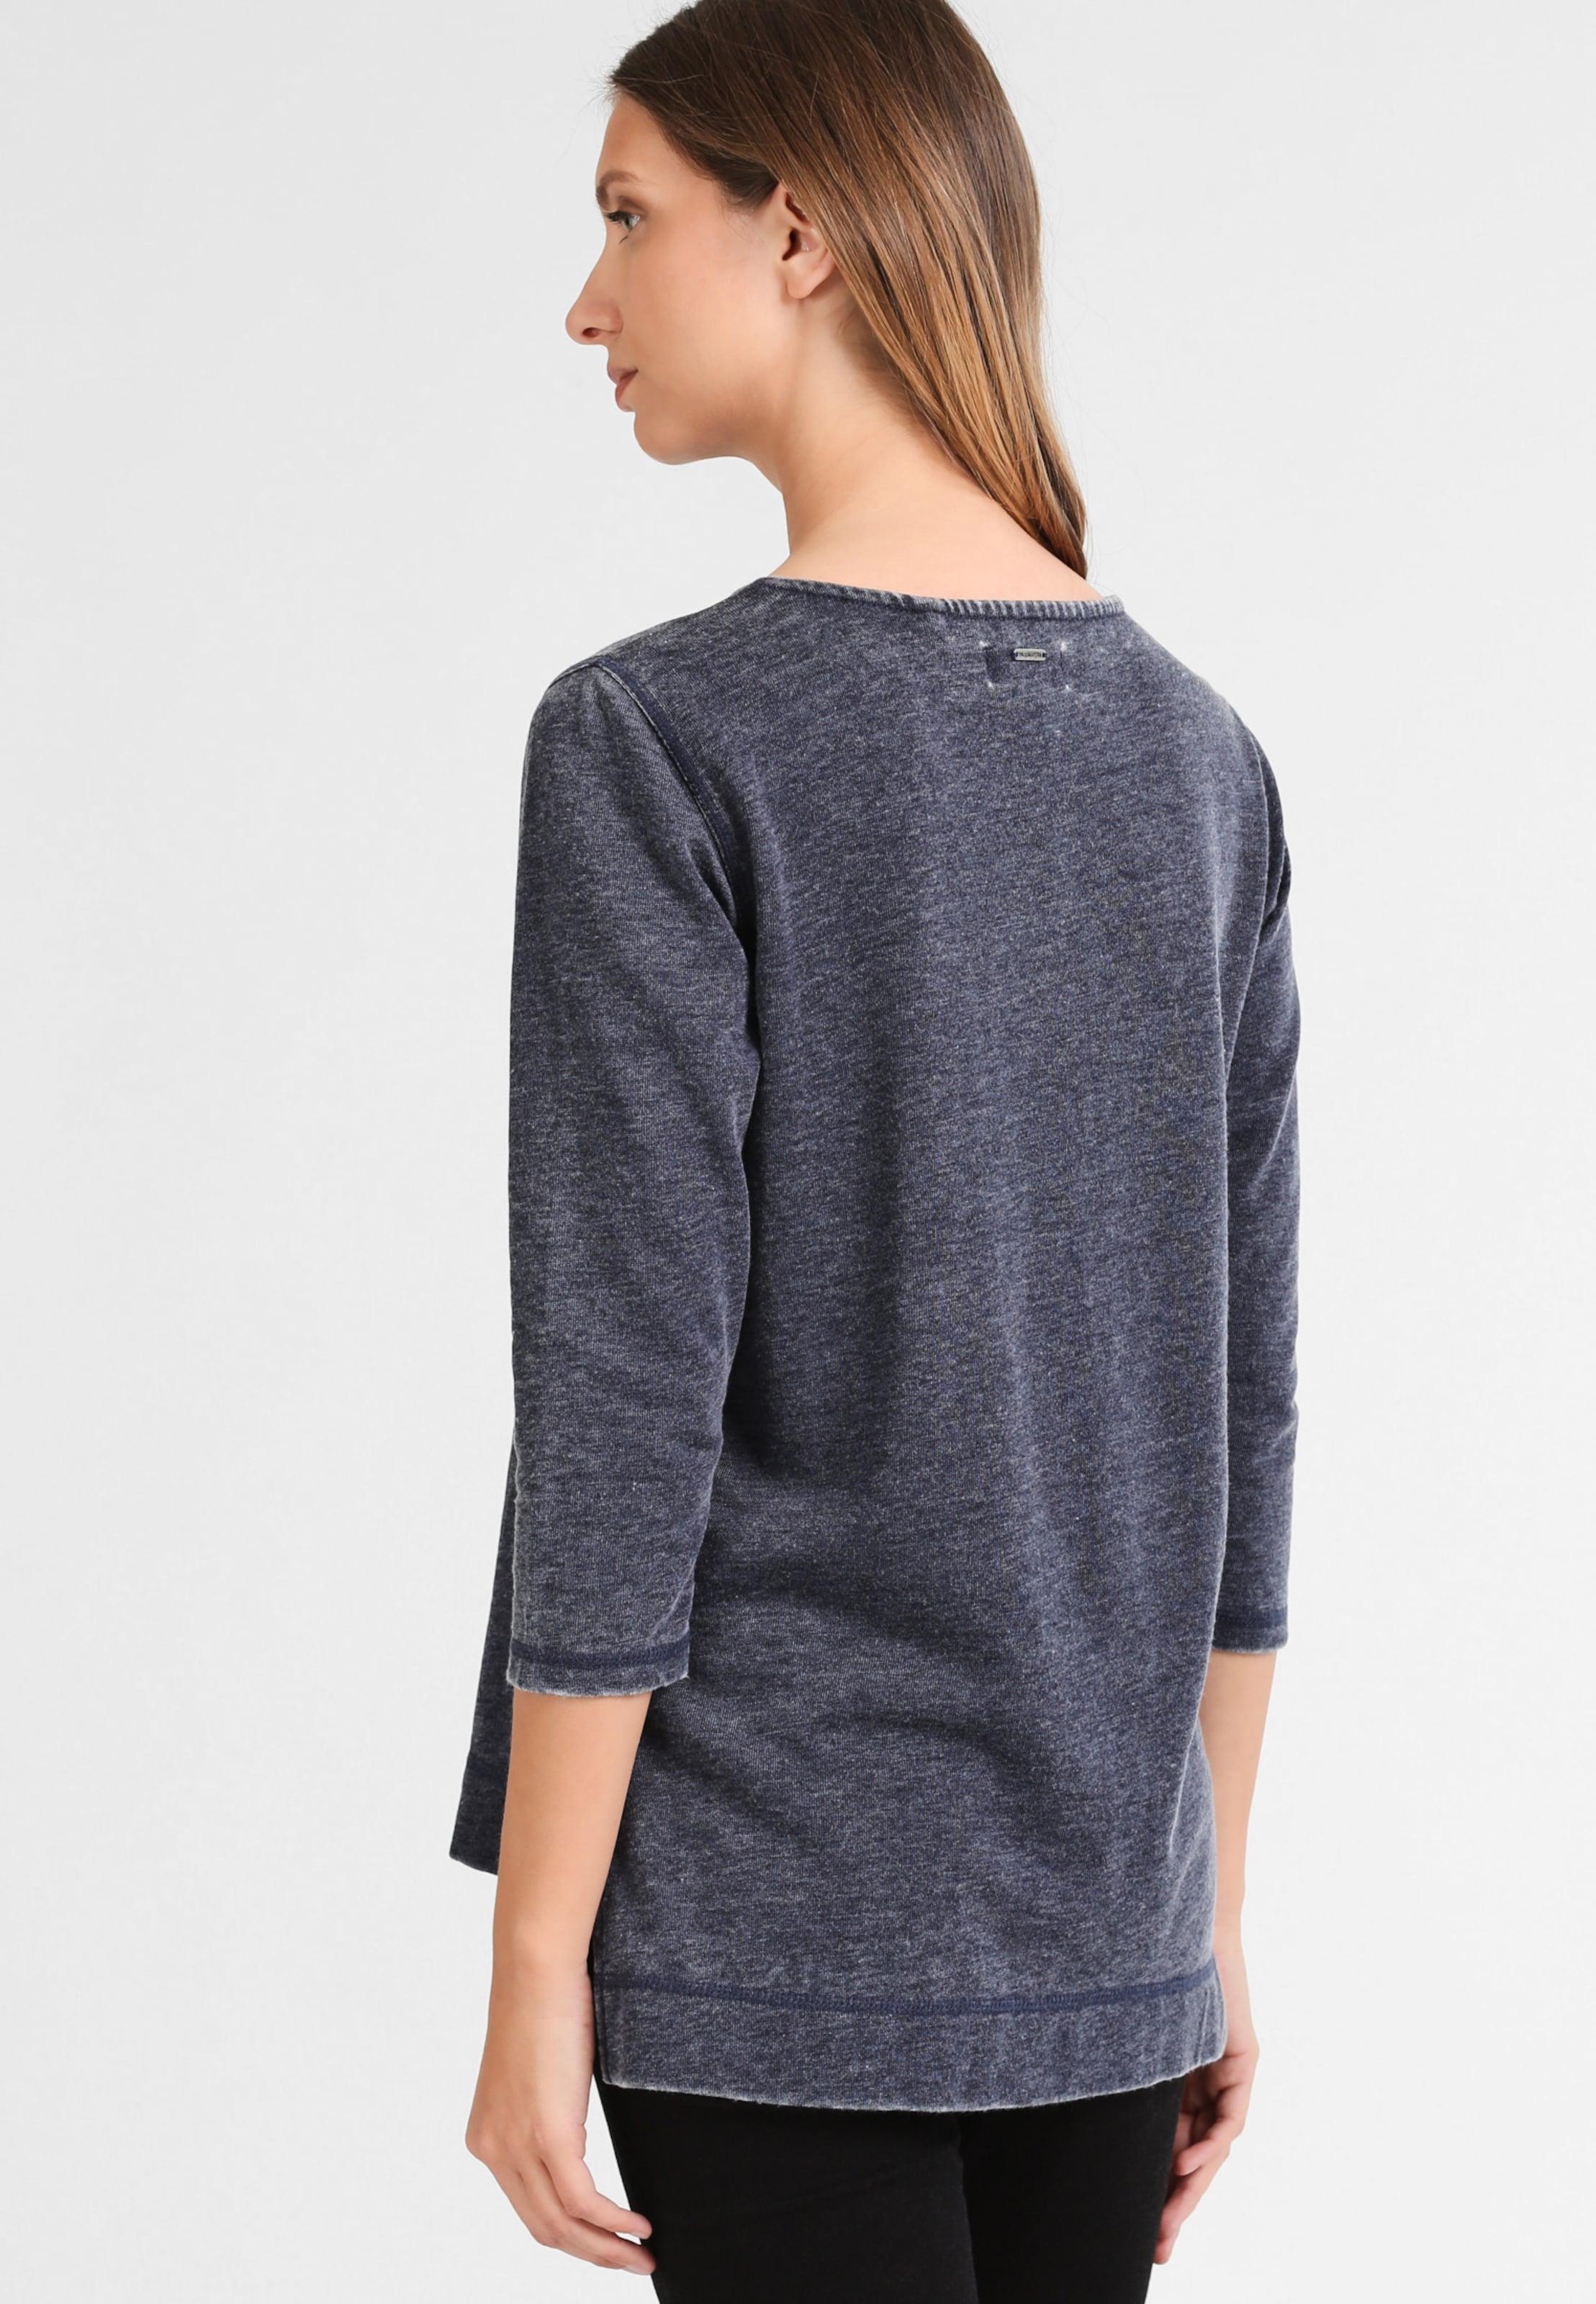 shirt Sweat En Dreimaster gris Bleu 34RjAq5L